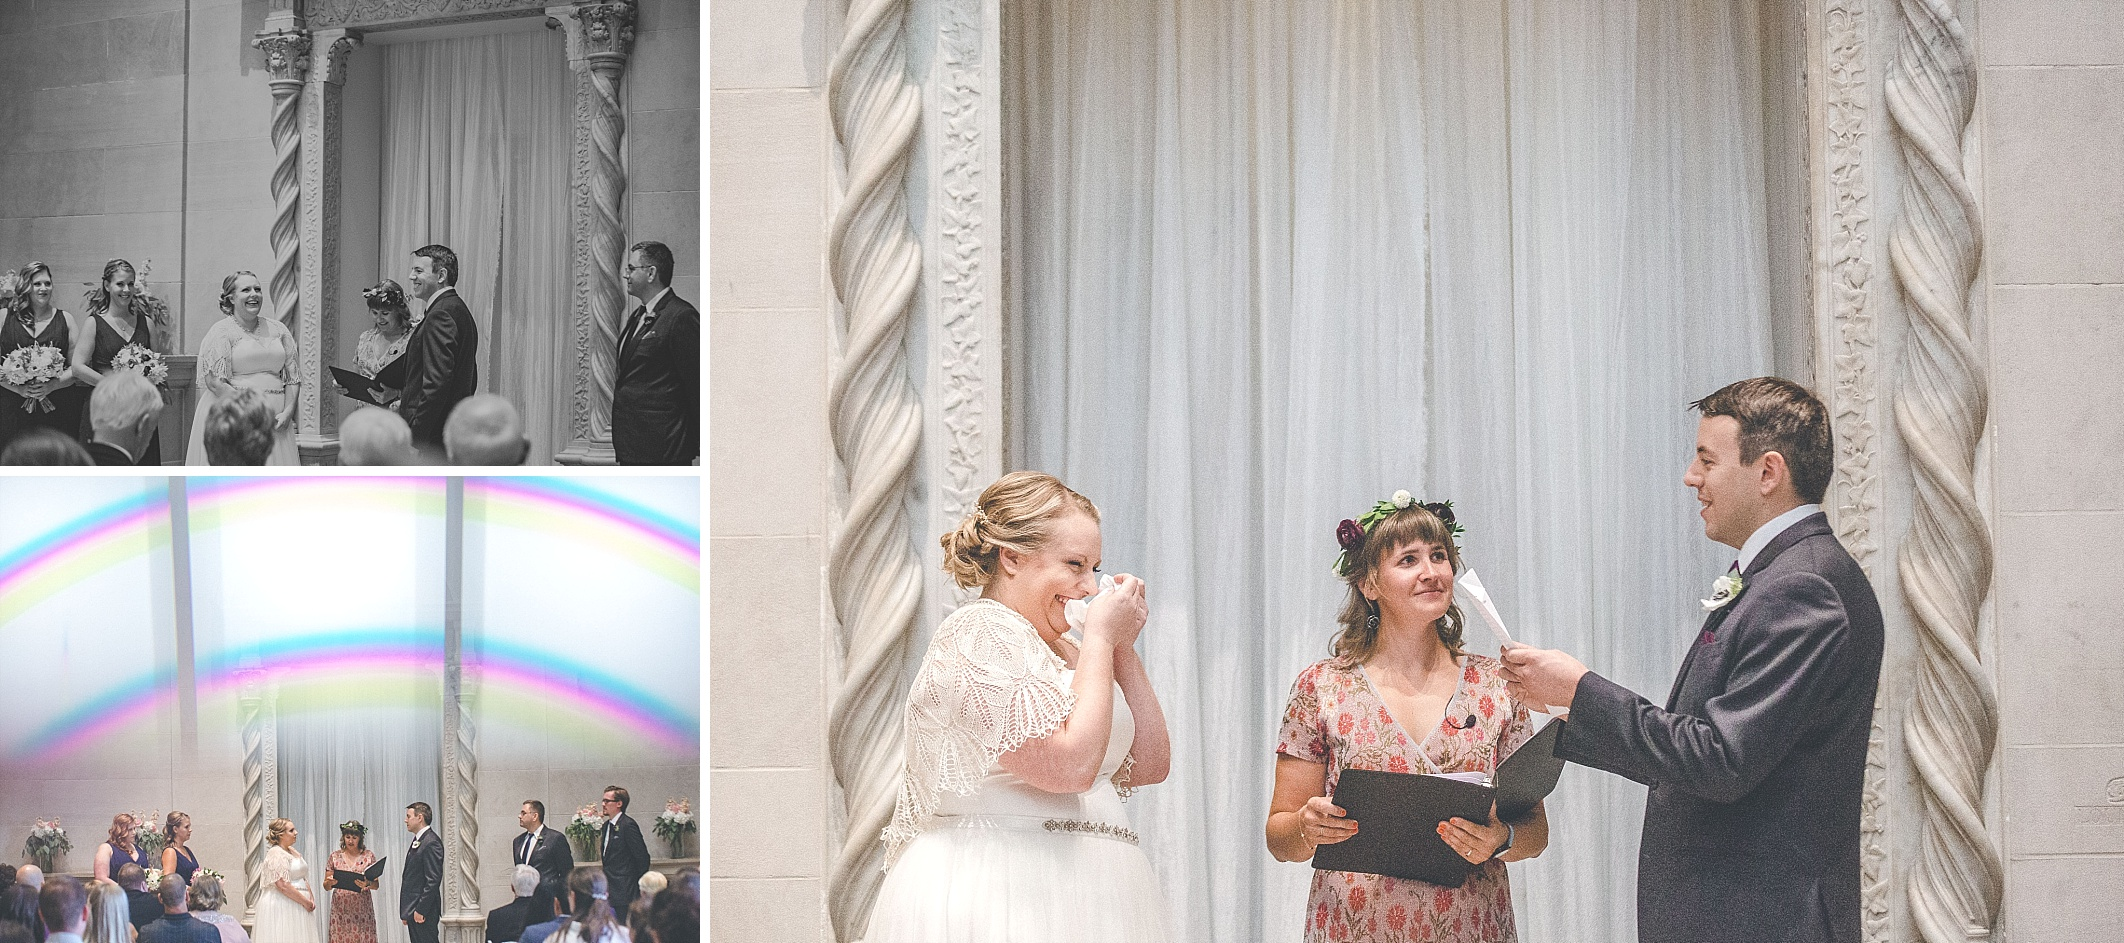 wedding-photographer-dayton-ohio_0012.jpg